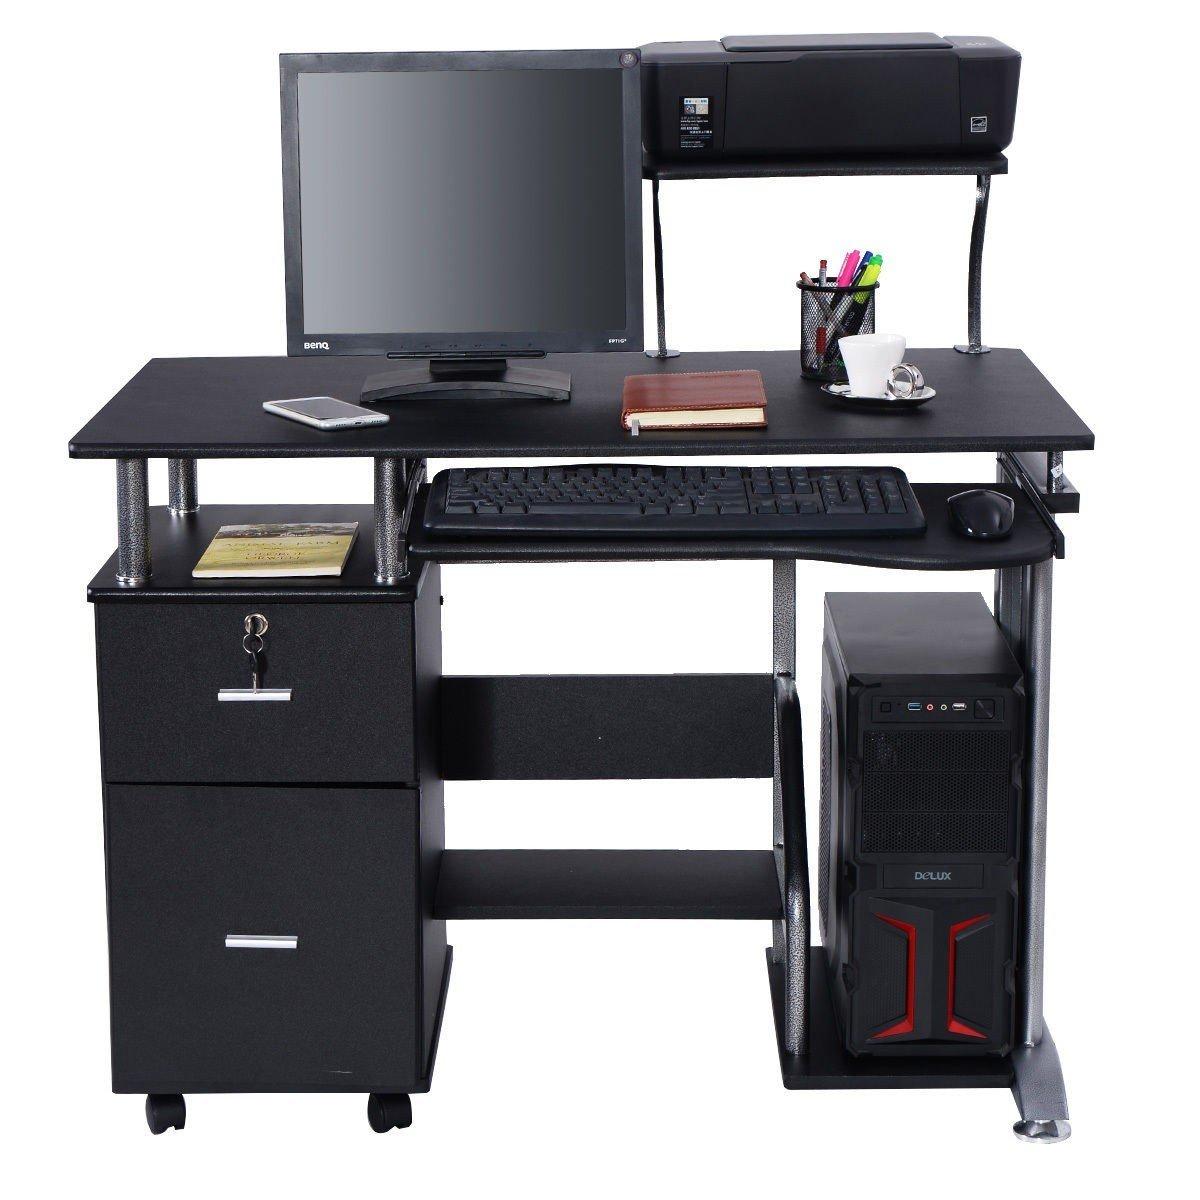 Black Computer Desk with Printer Shelf by Apontus (Image #1)